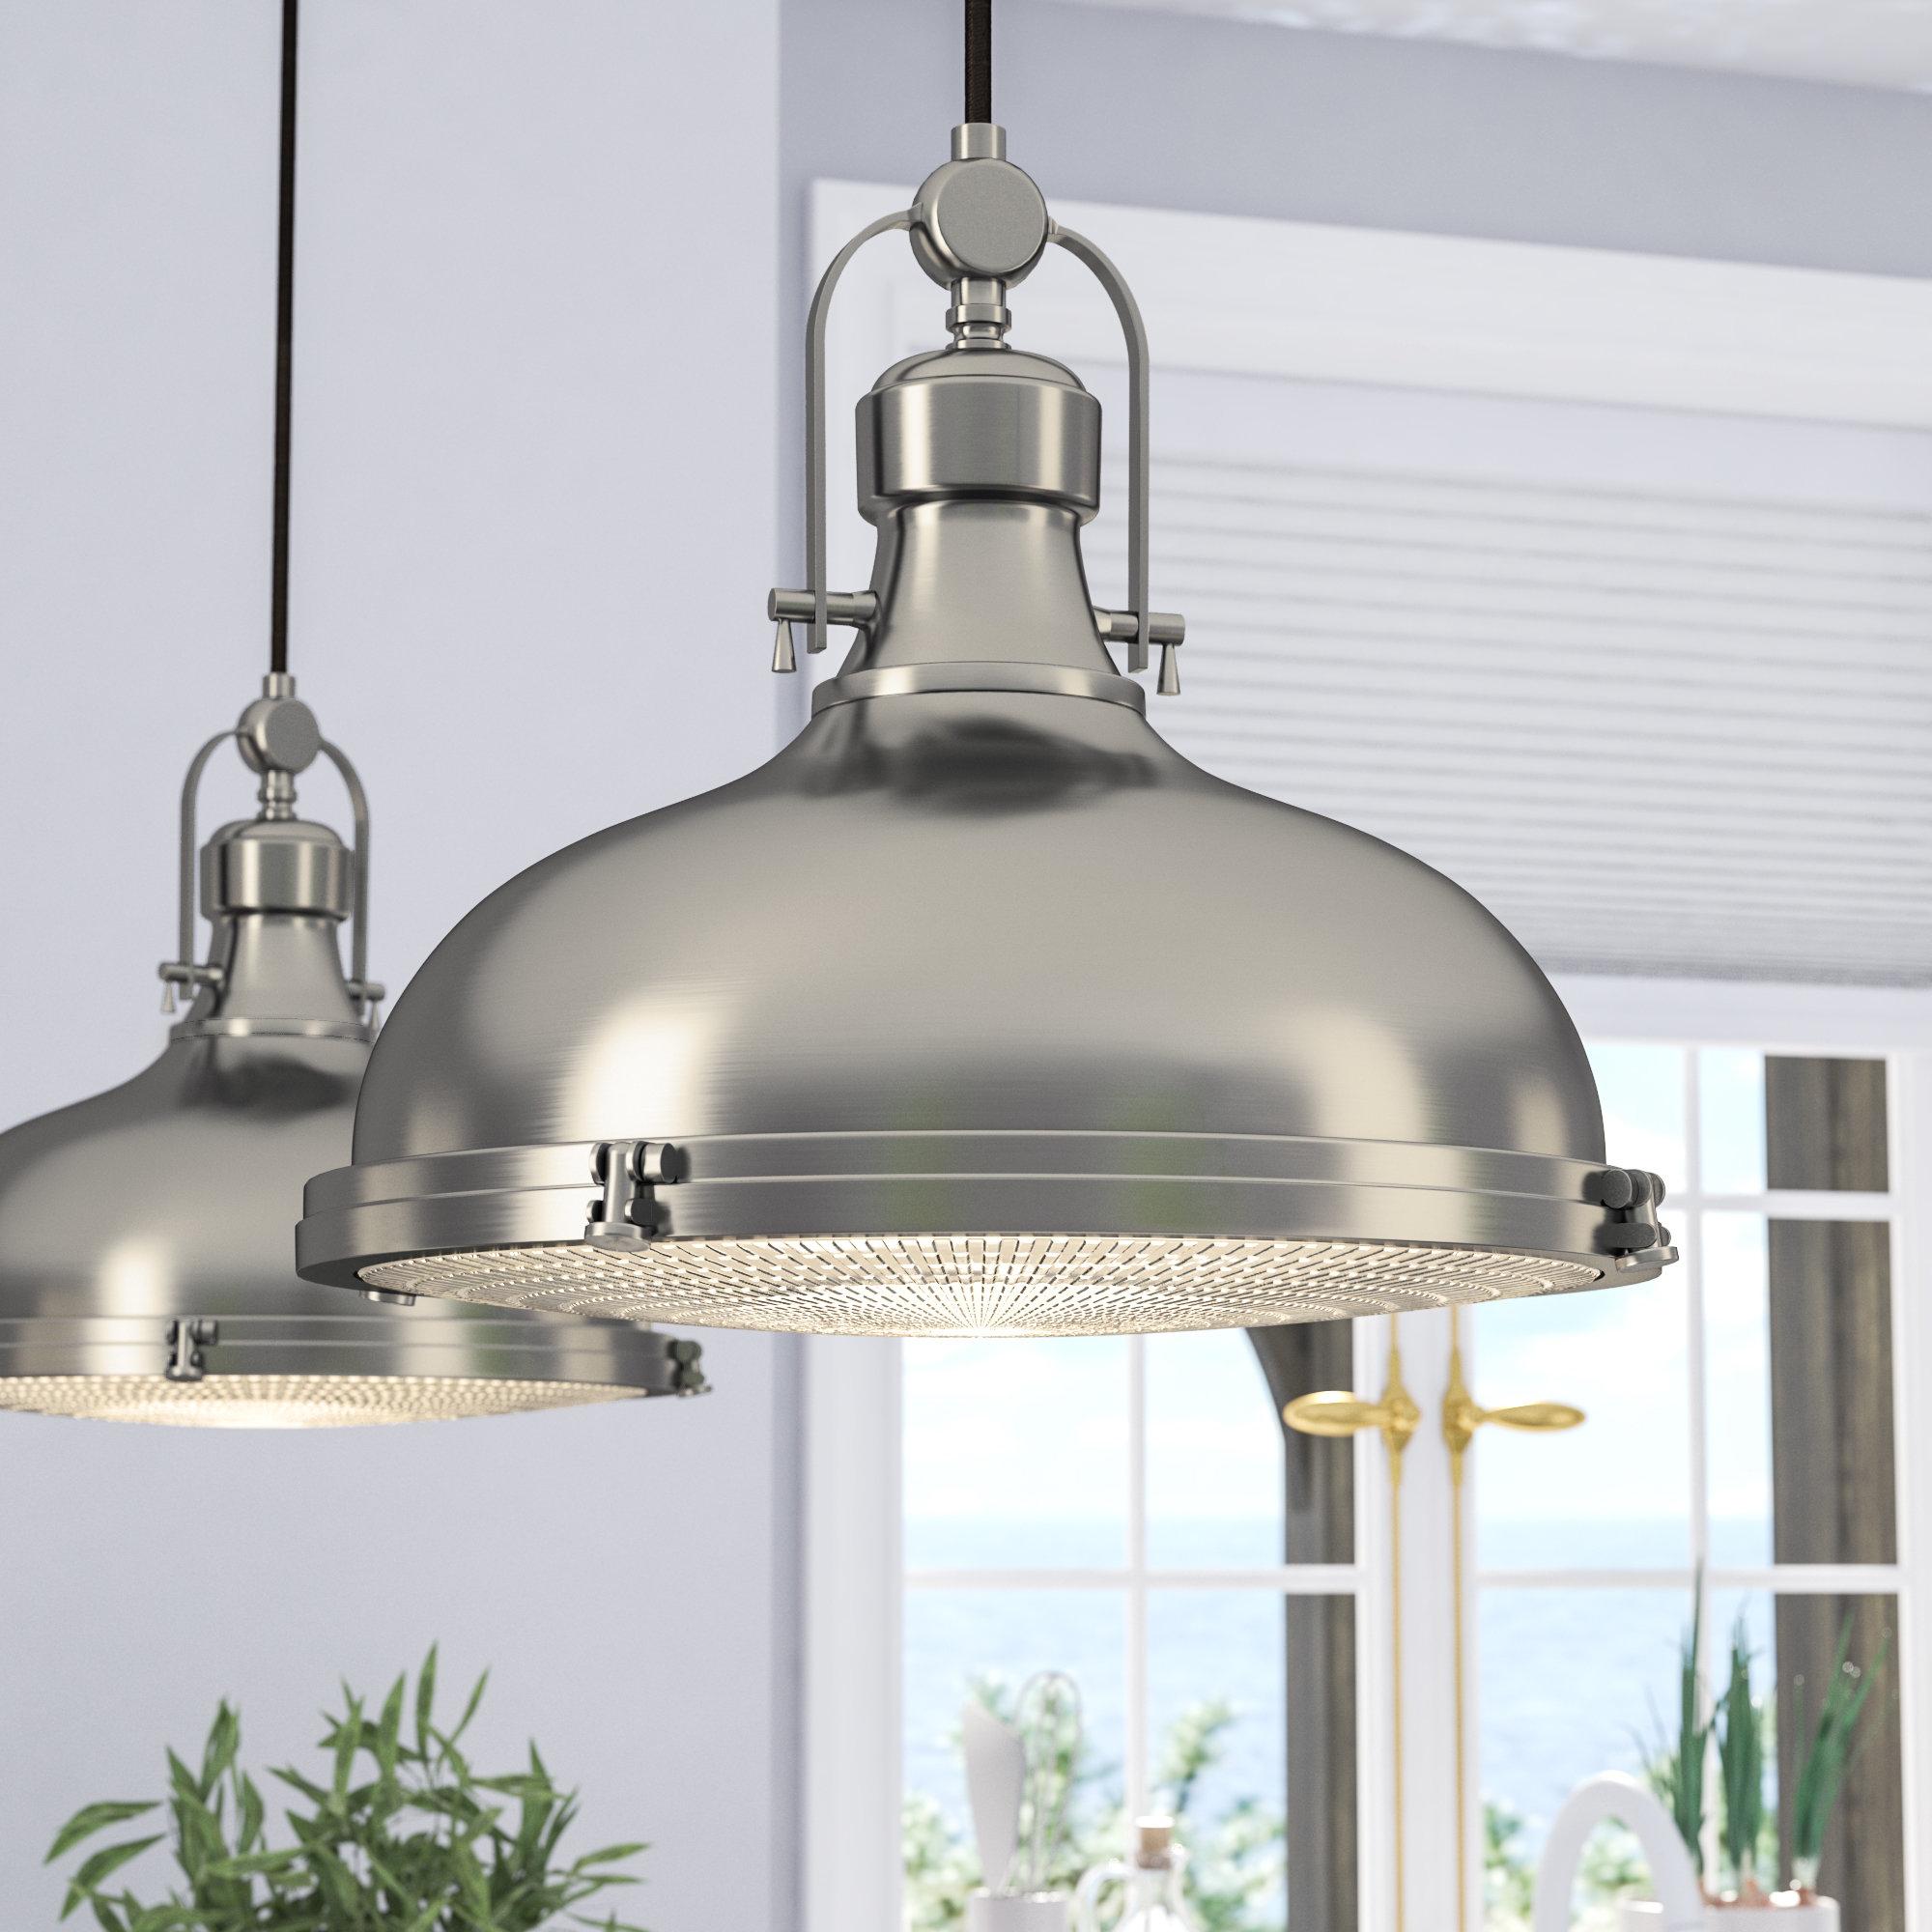 Most Recent Freeda 1 Light Single Dome Pendant Within 1 Light Single Dome Pendants (View 2 of 20)